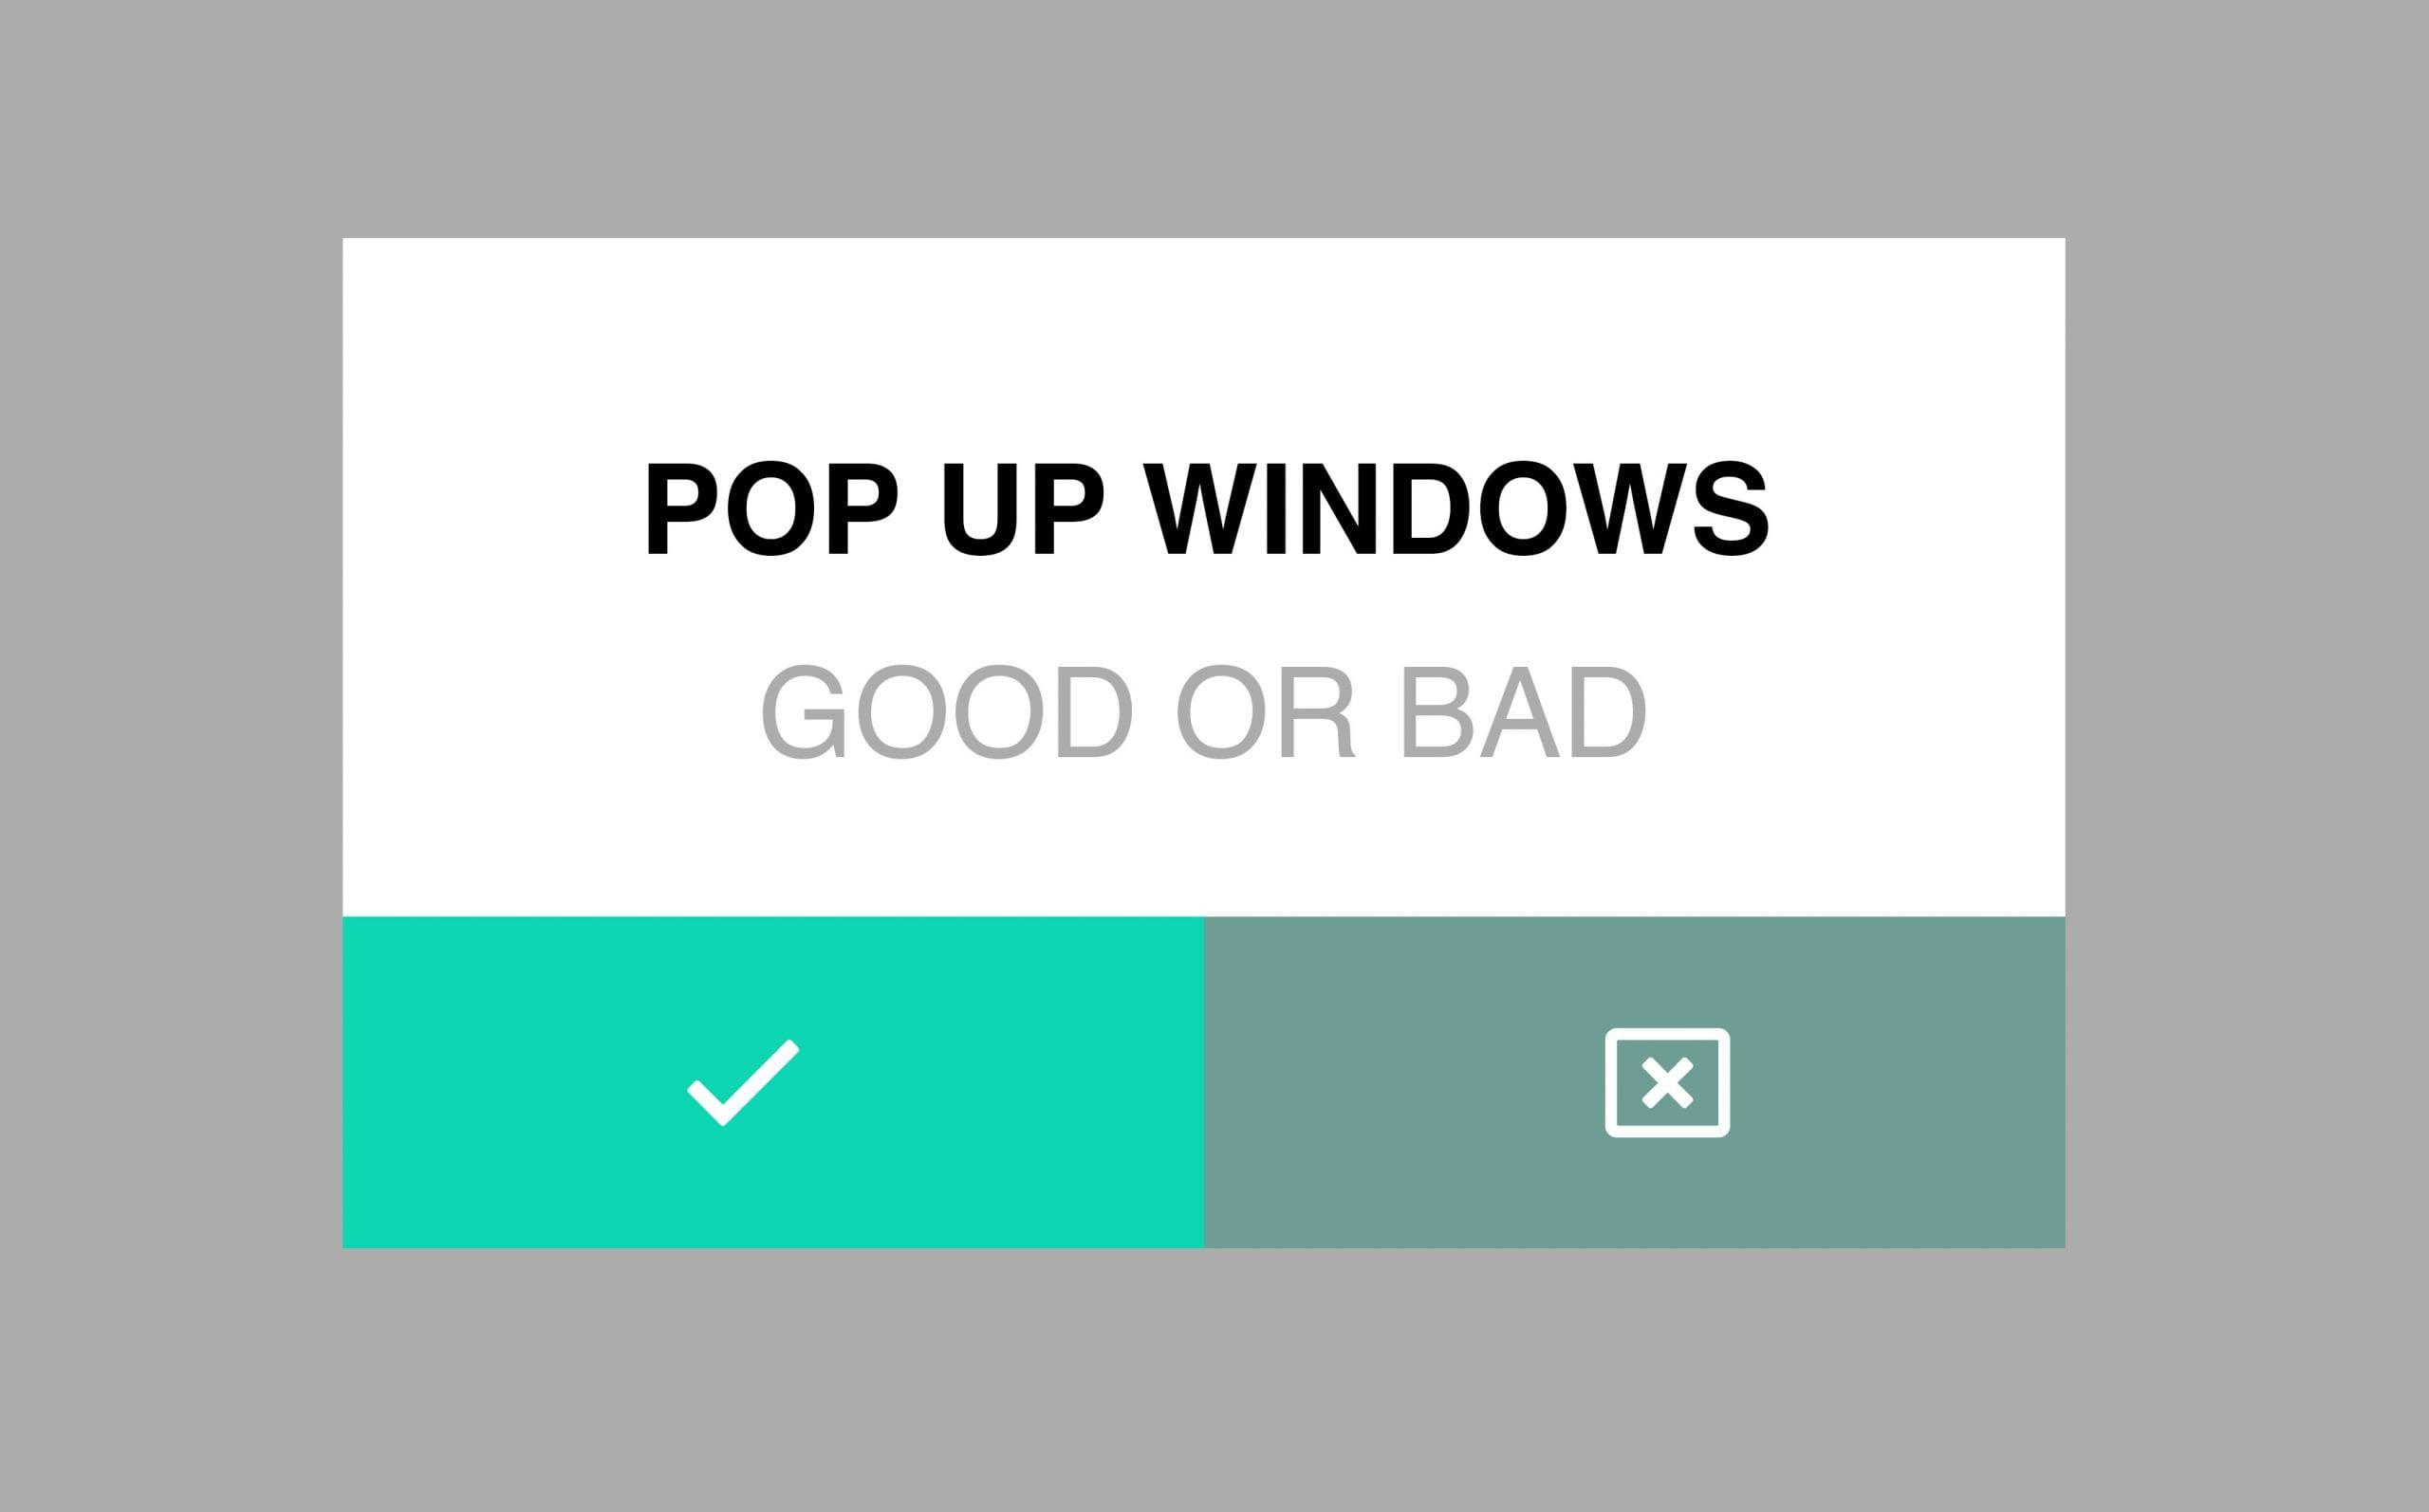 pop-up windows good or bad West palm beach